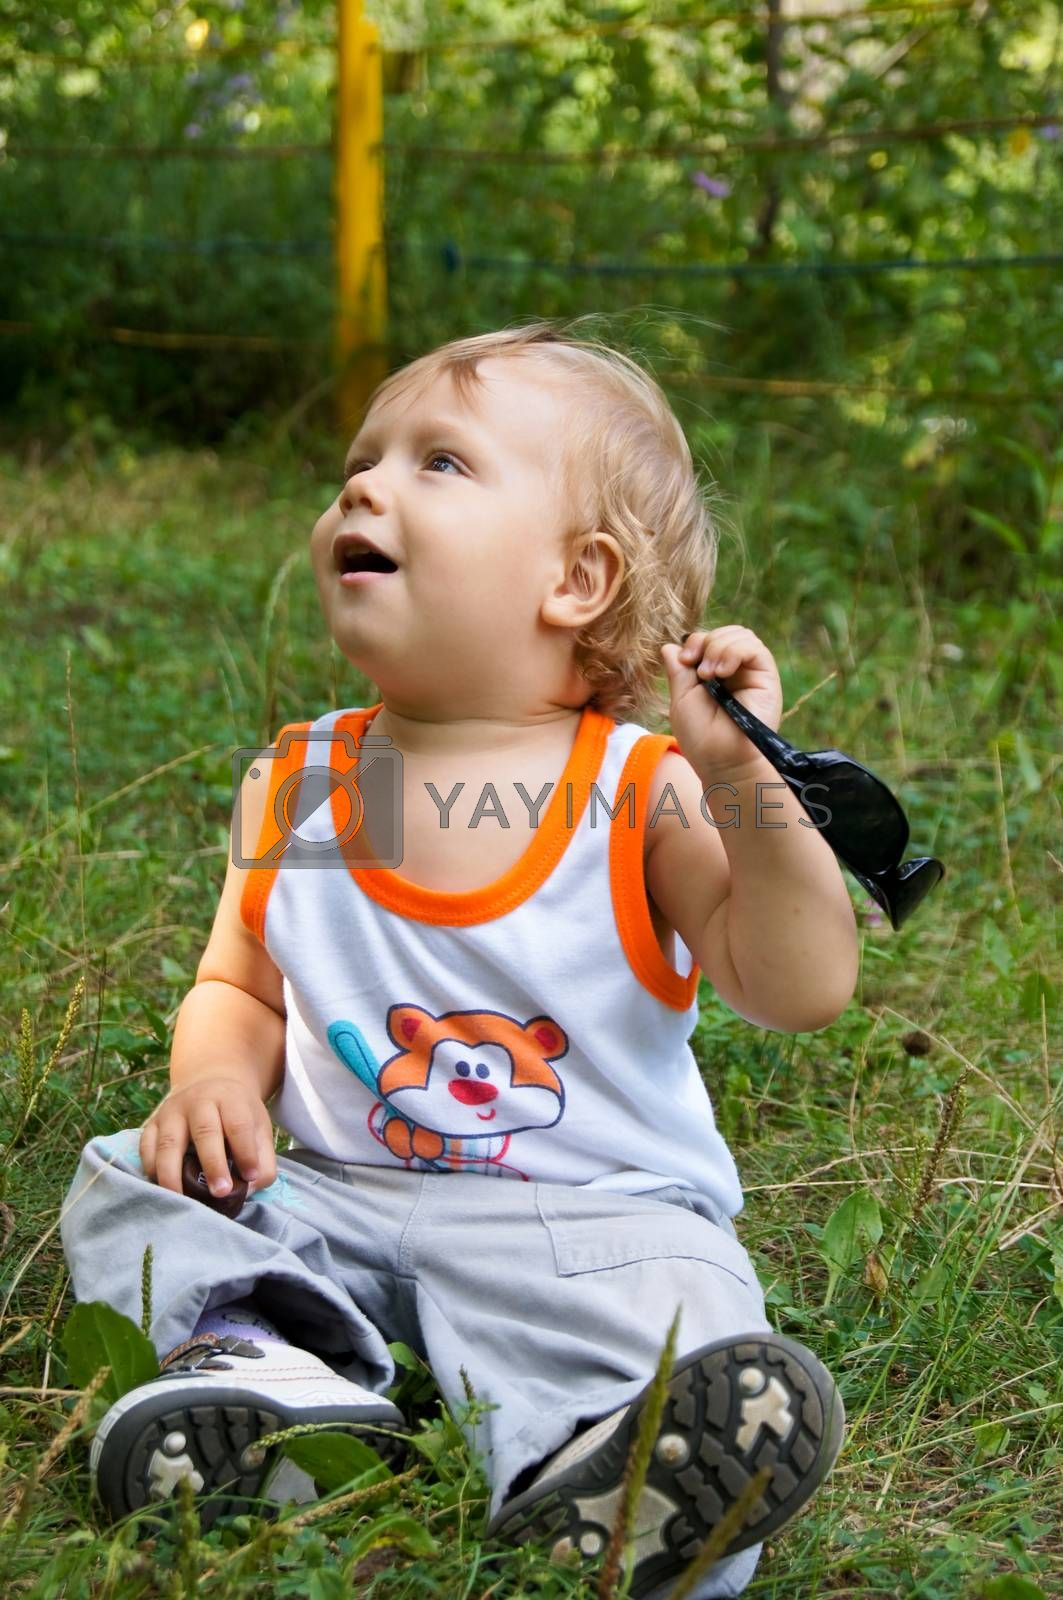 The amusing little boy on walk